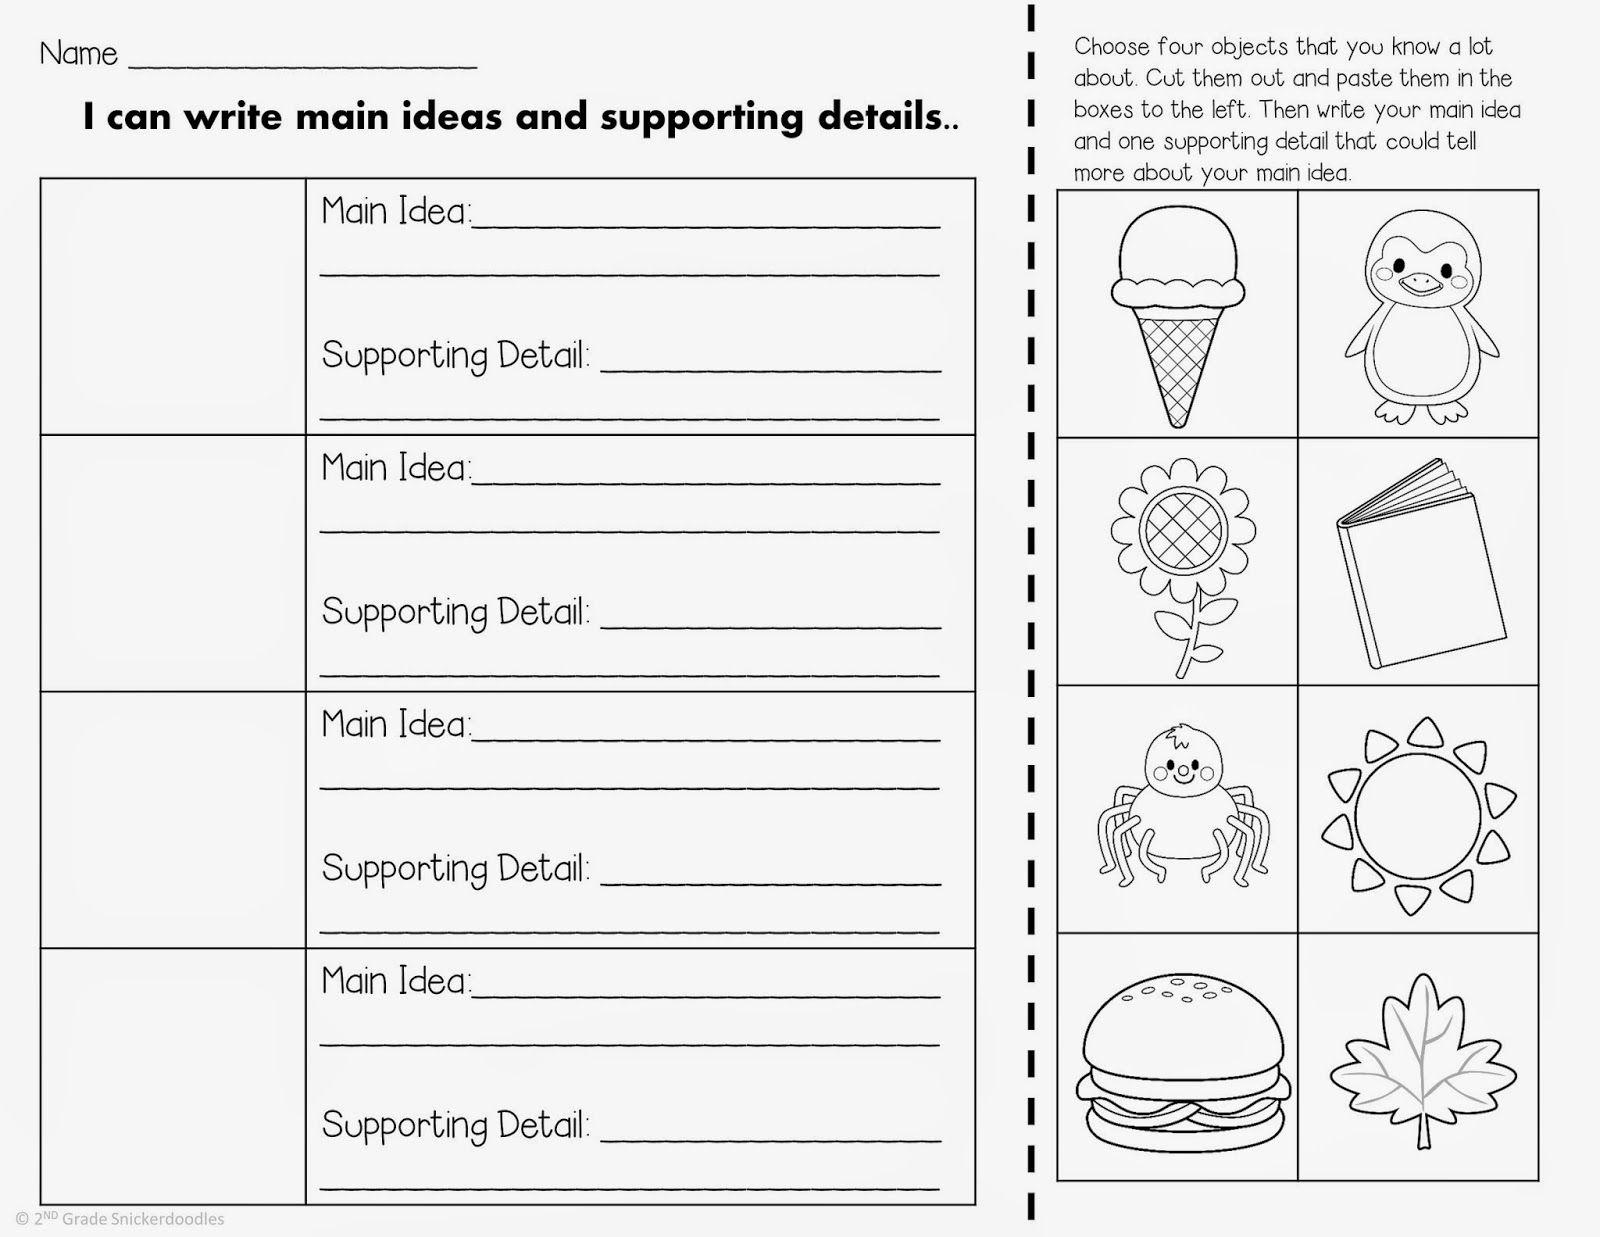 2nd Grade Snickerdoodles Main Idea And Supporting Details Main Idea Worksheet 2nd Grade Worksheets Main Idea [ 1237 x 1600 Pixel ]